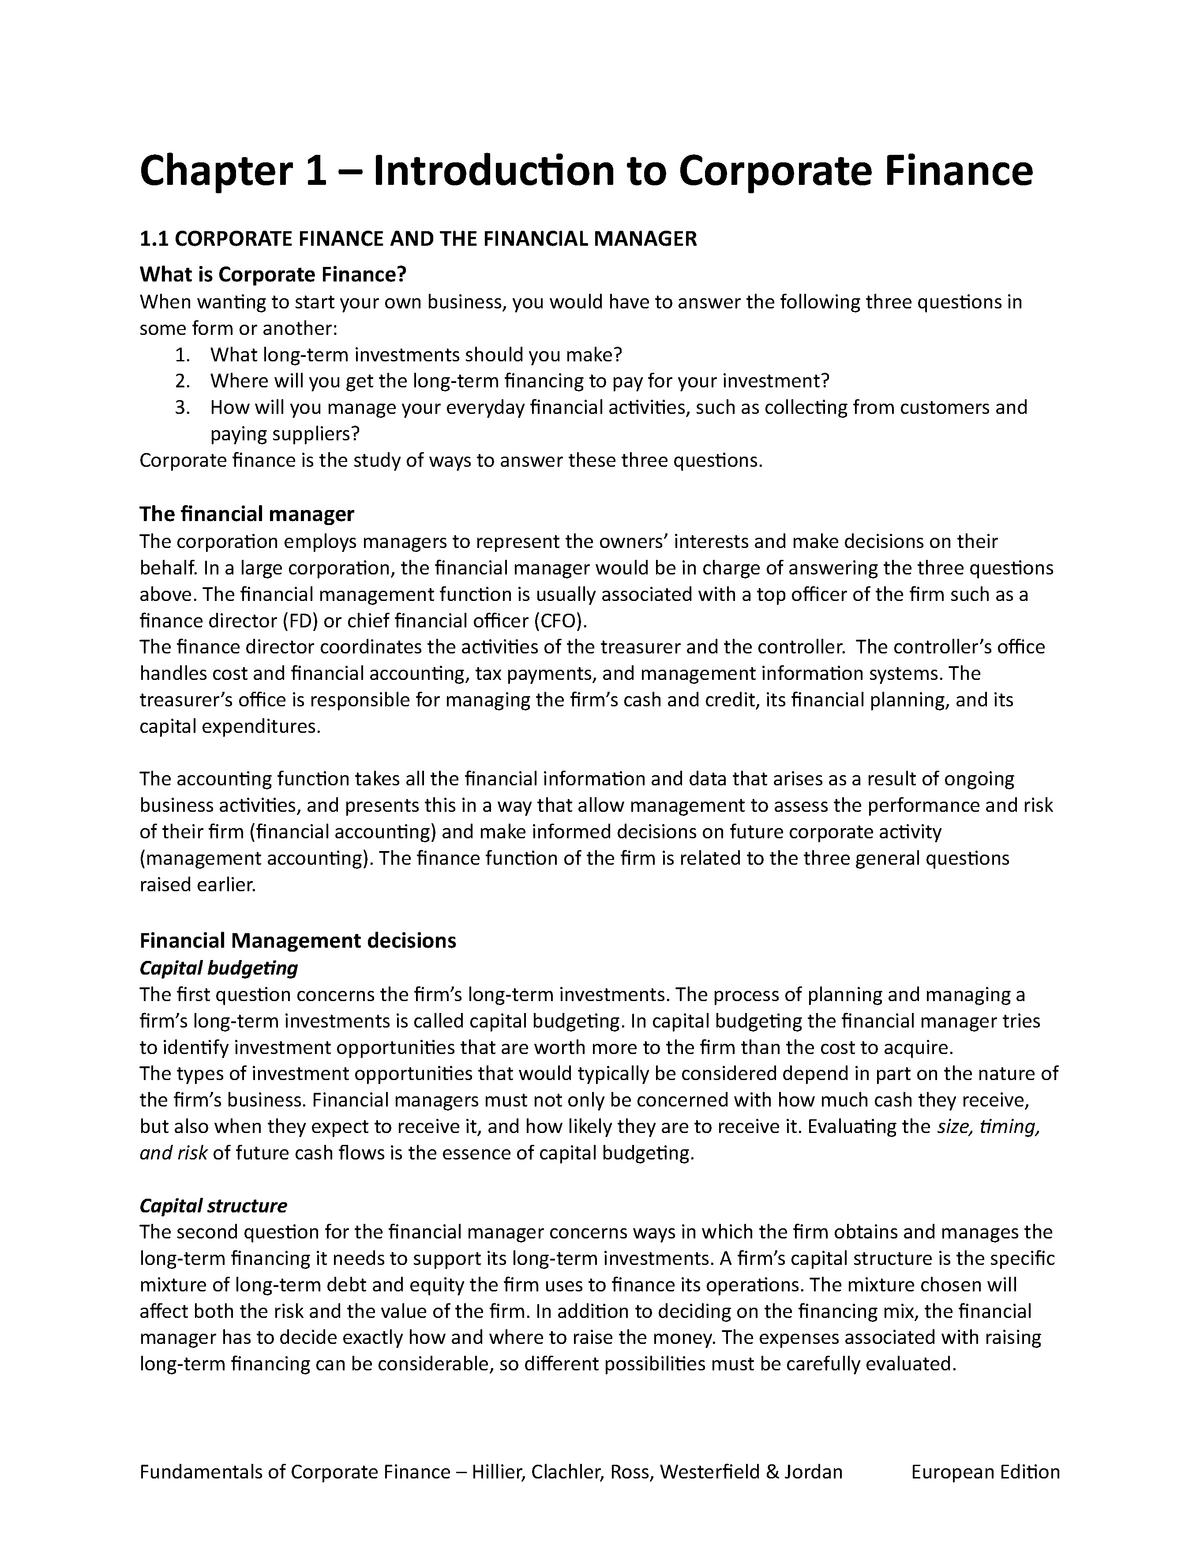 Fundamentals Of Corporate Finance Chapter 1 Studeersnel